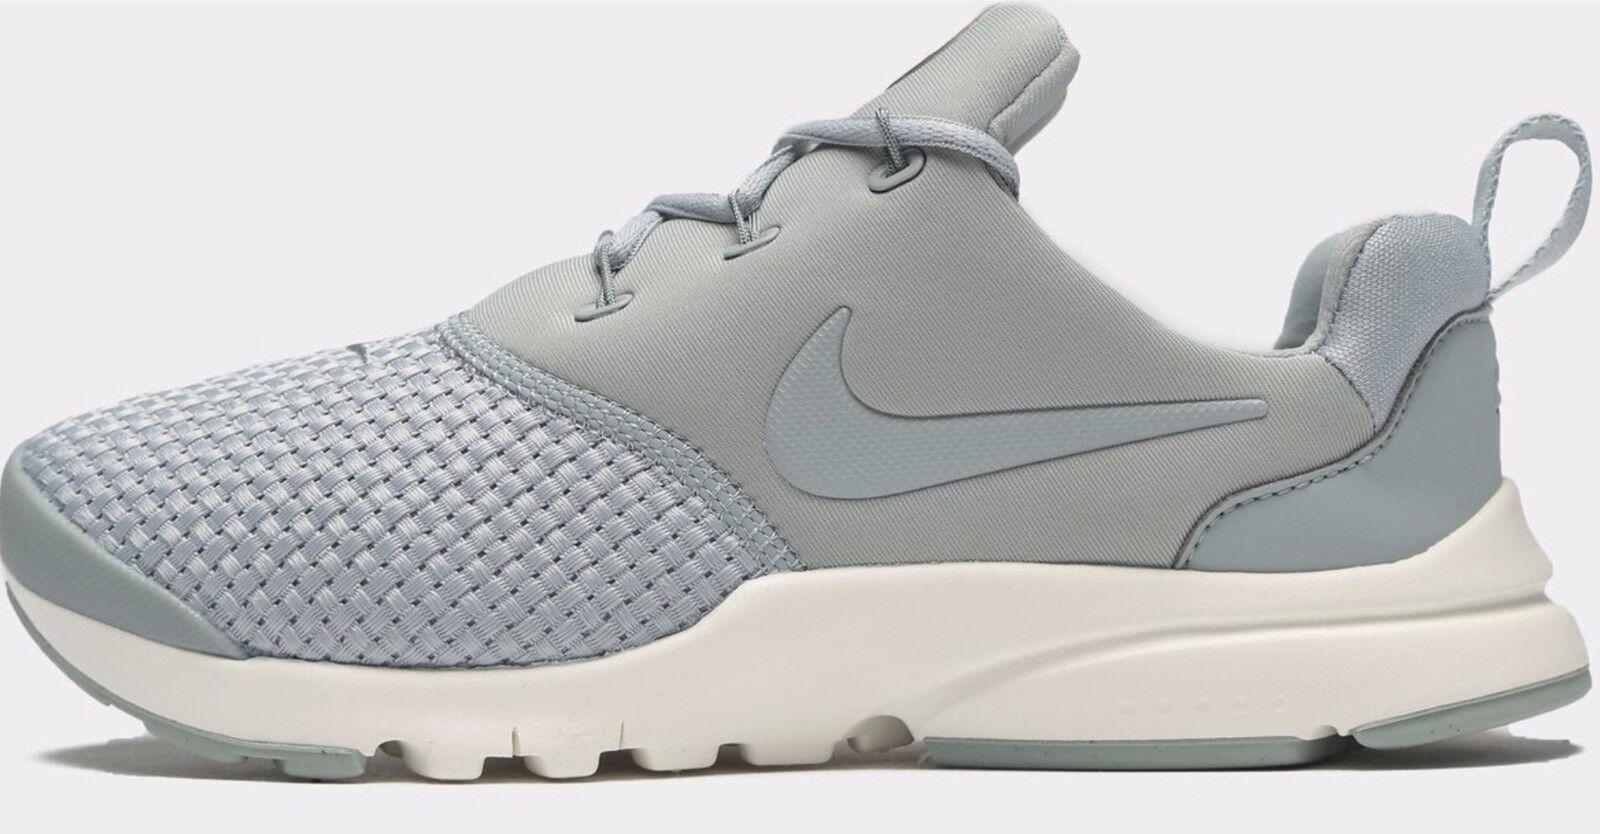 Nike Presto Flyknit Damenschuhe Trainers. EUR. Größe 4.5 UK, 37.5 EUR. Trainers. New. Running / Gym. 4f0a0b